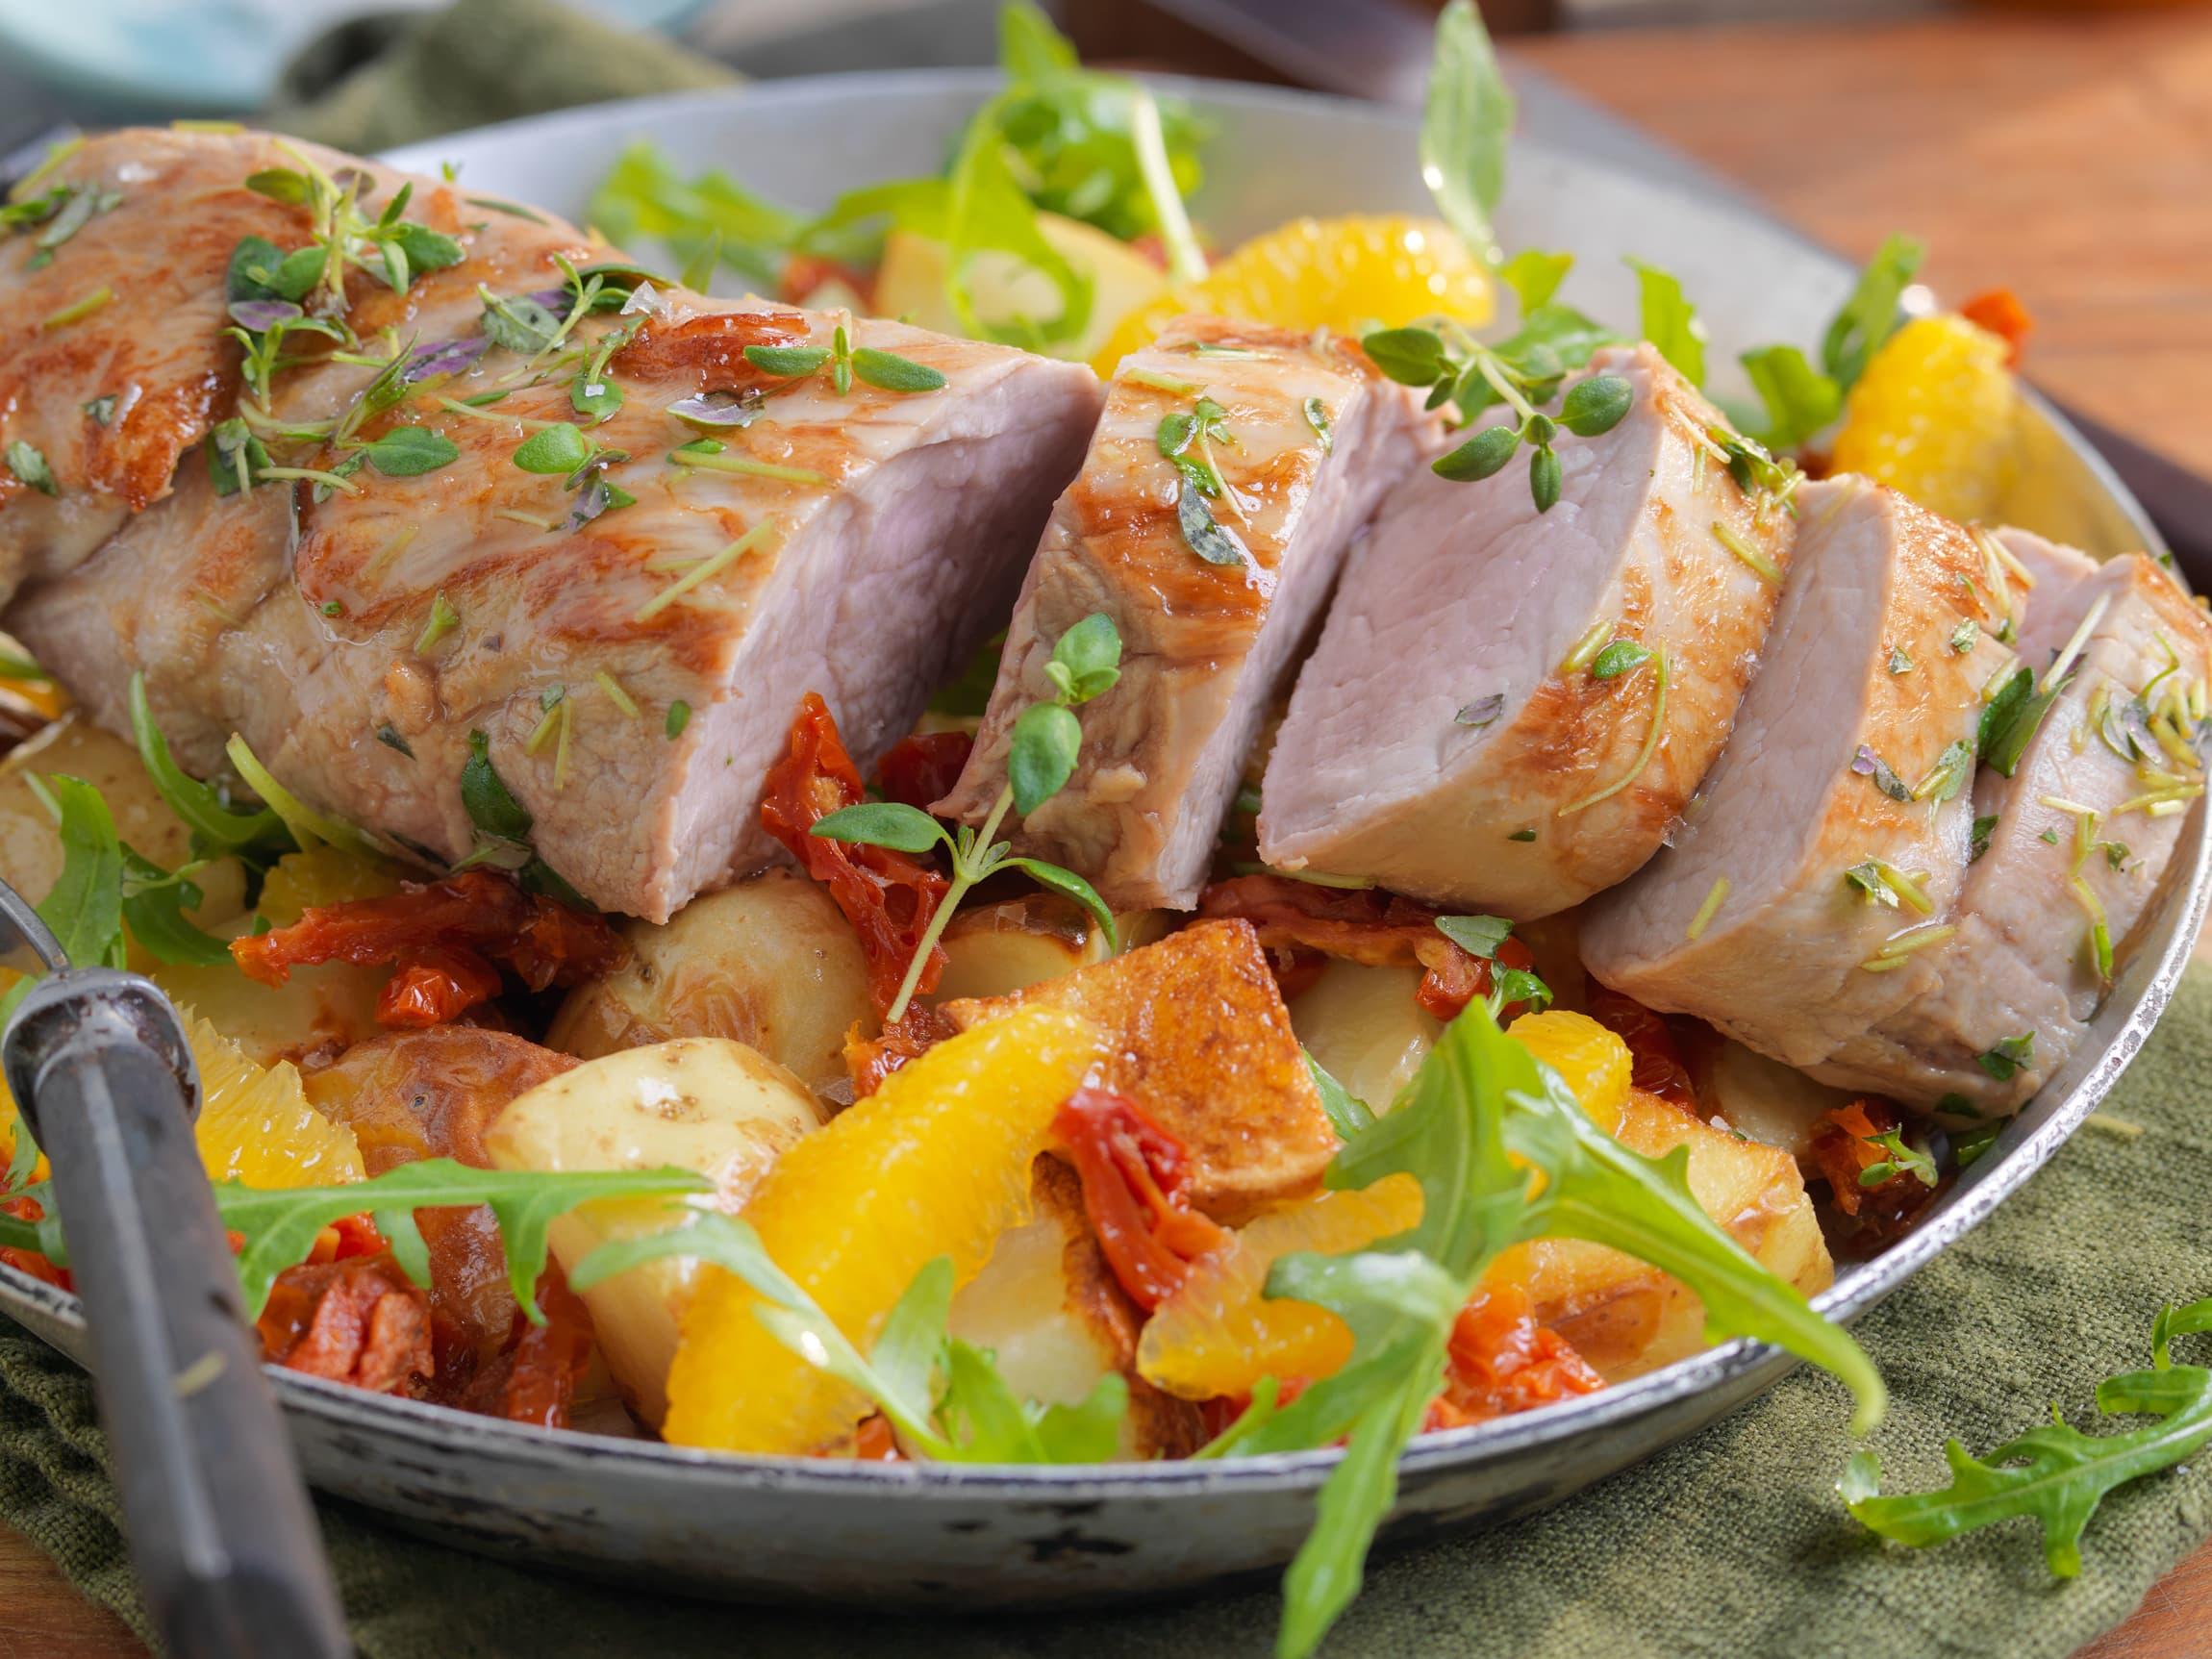 SVINFILET MED BAKT APPELSIN: Denne deilige middagen passer perfekt om høsten.